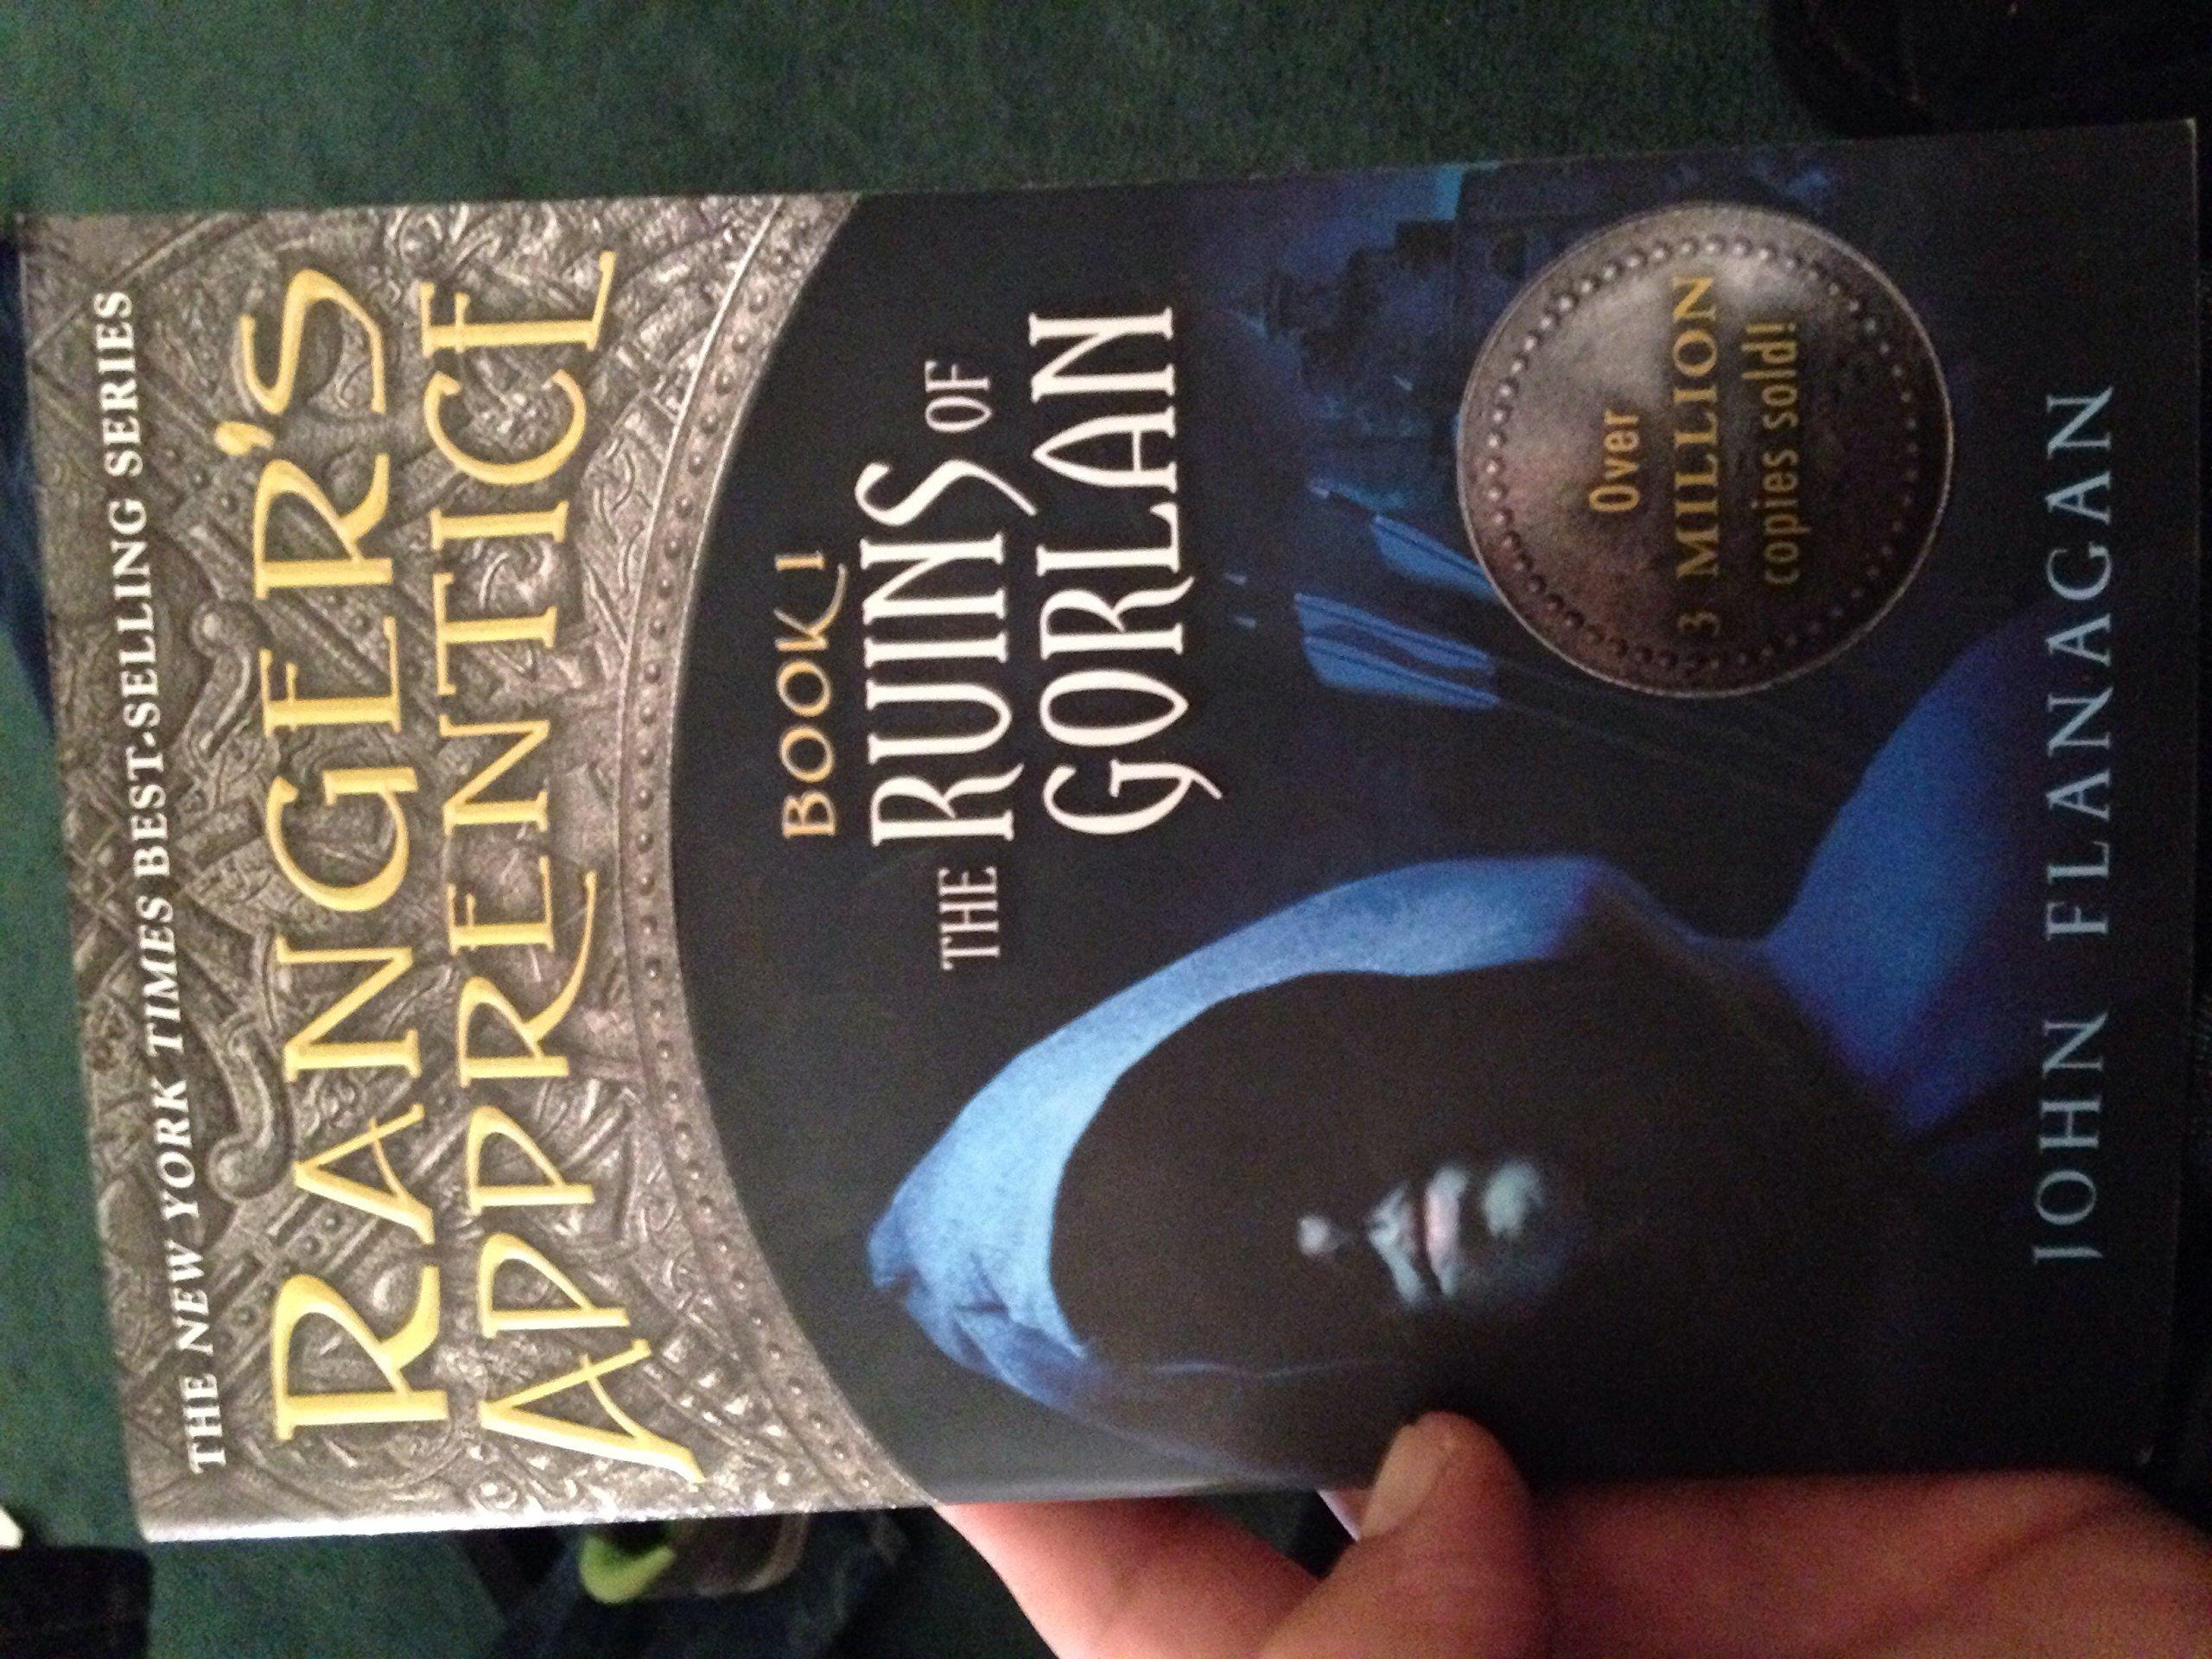 Download Ranger's Apprentice: The Ruins of Gorlan Book One (The Ruins of Gorlan, Book One) PDF